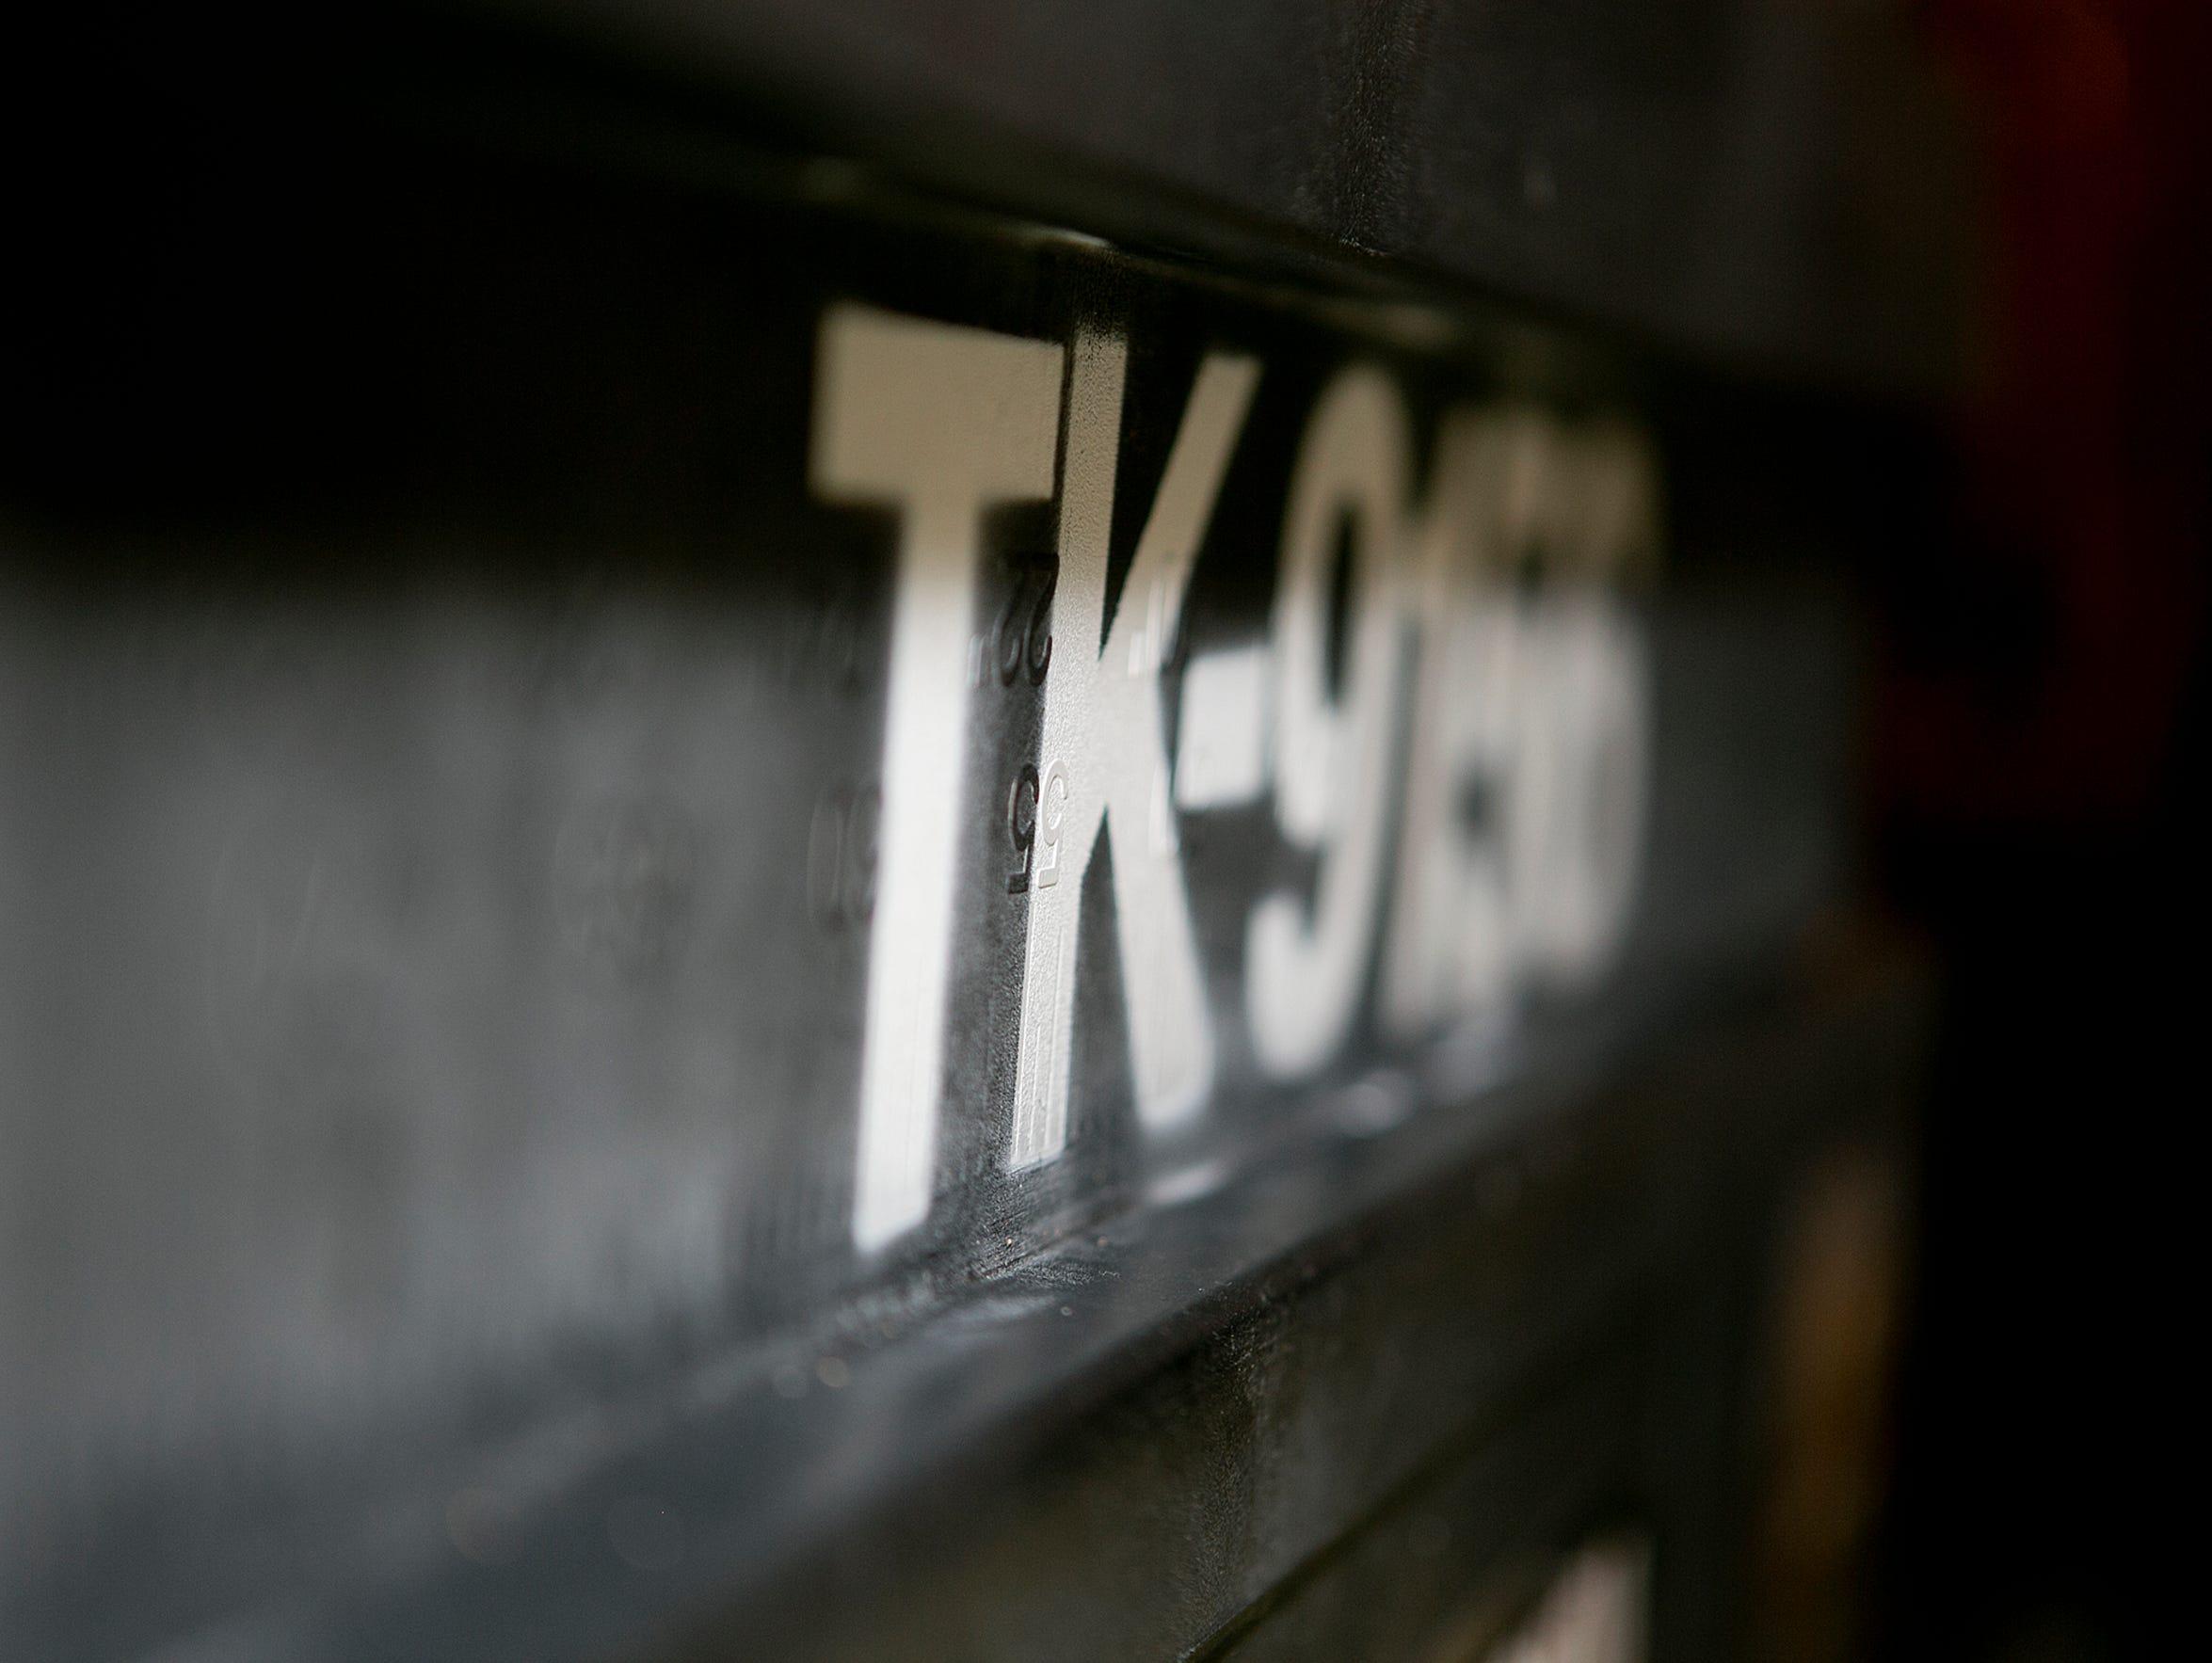 Frank Wileman's Stormtrooper name, TK-9156, is displayed